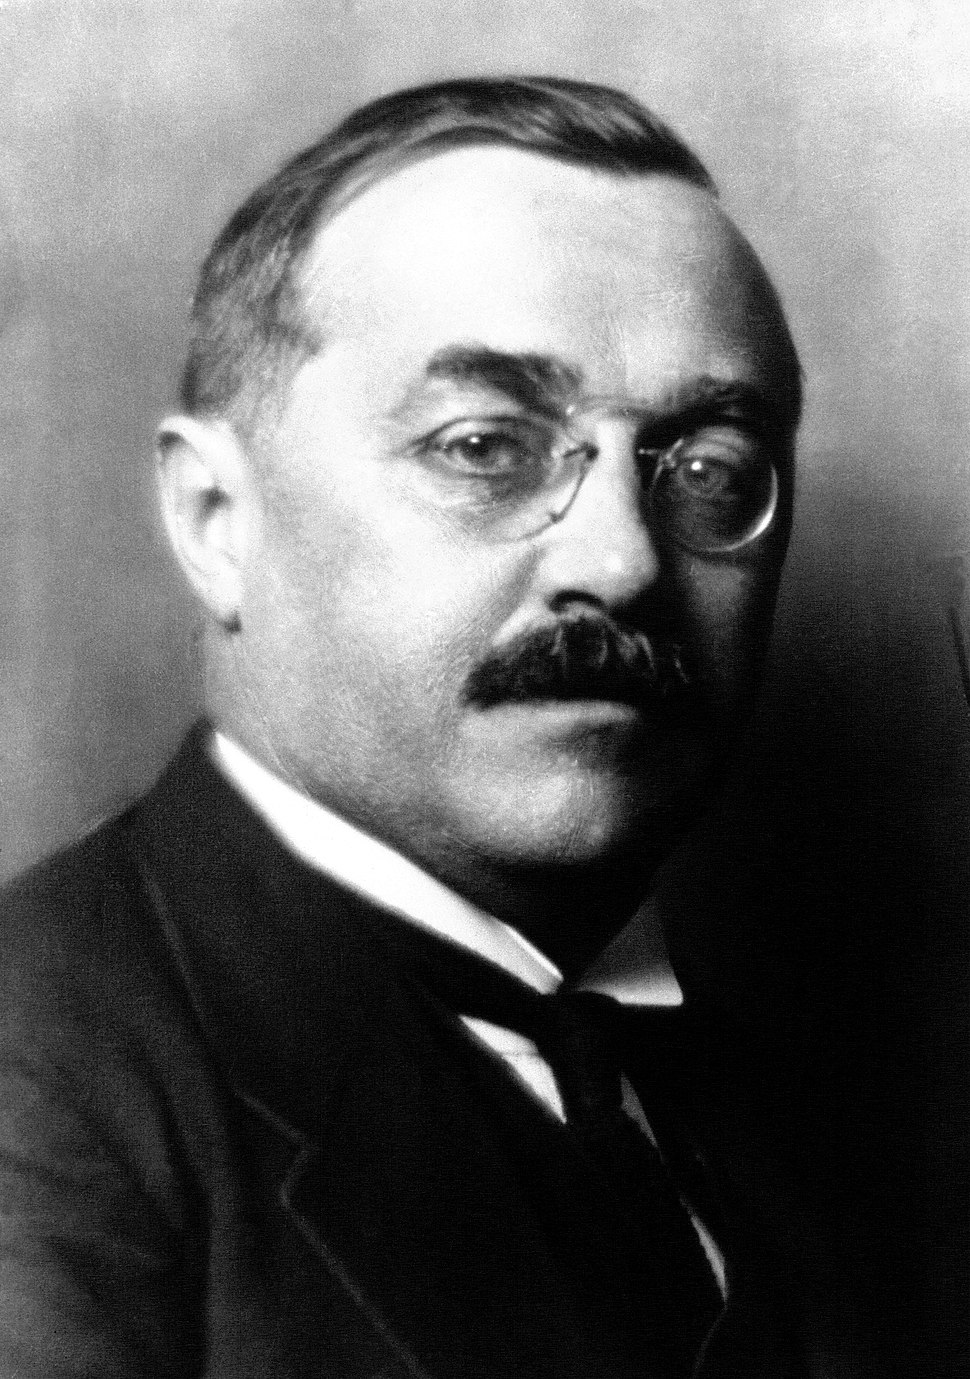 Buresch, Karl, Chancellor of Austria, Agence Mondial, BNF Gallica